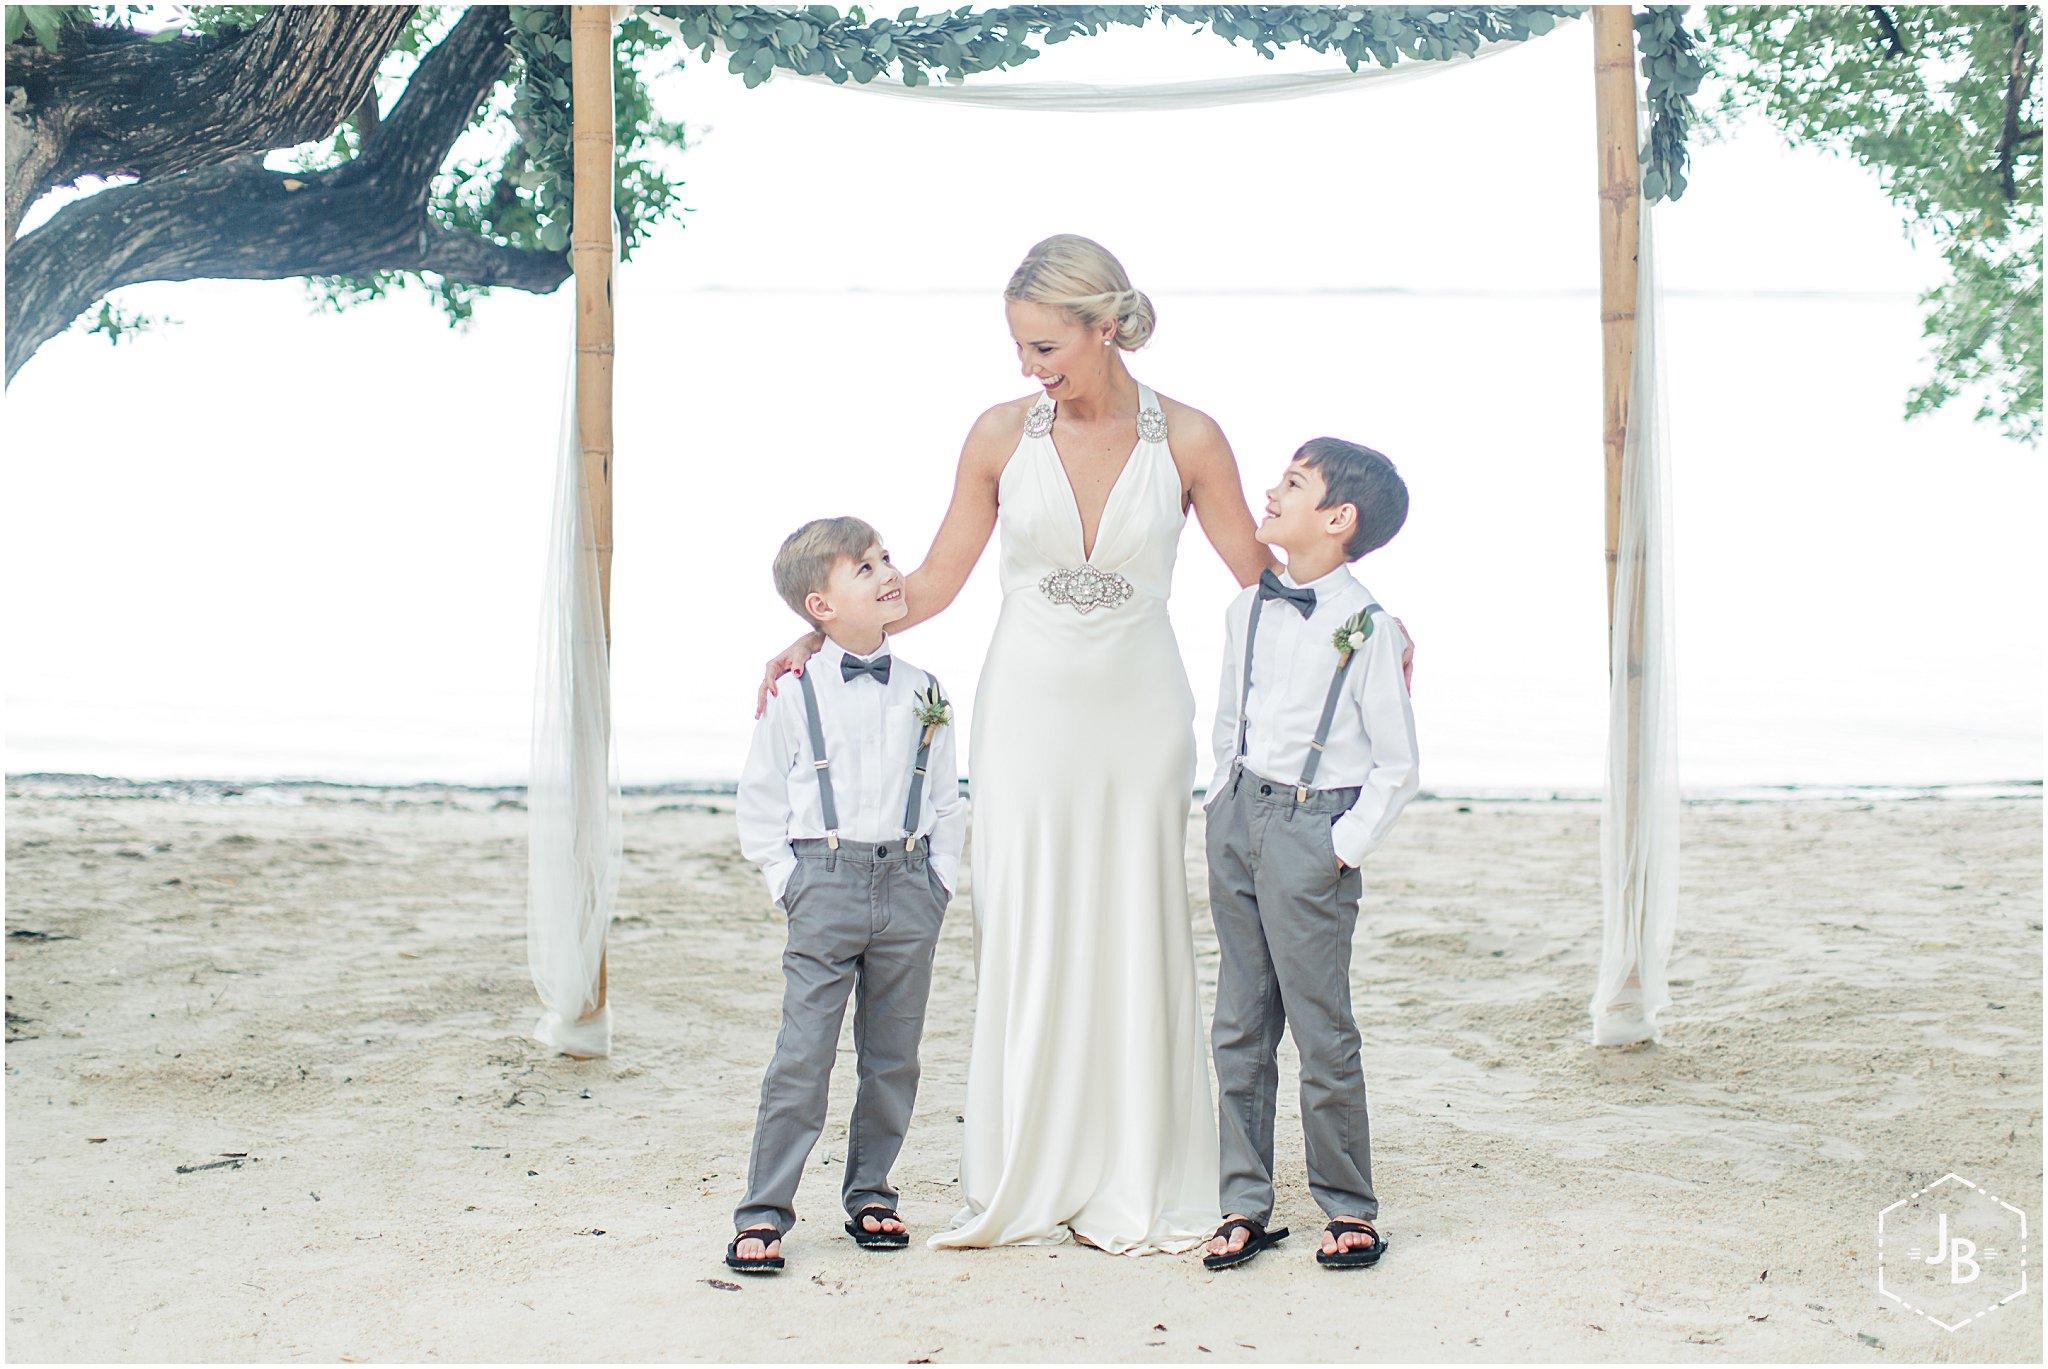 WeddingandEngagementFloridaPhotographer_1108.jpg